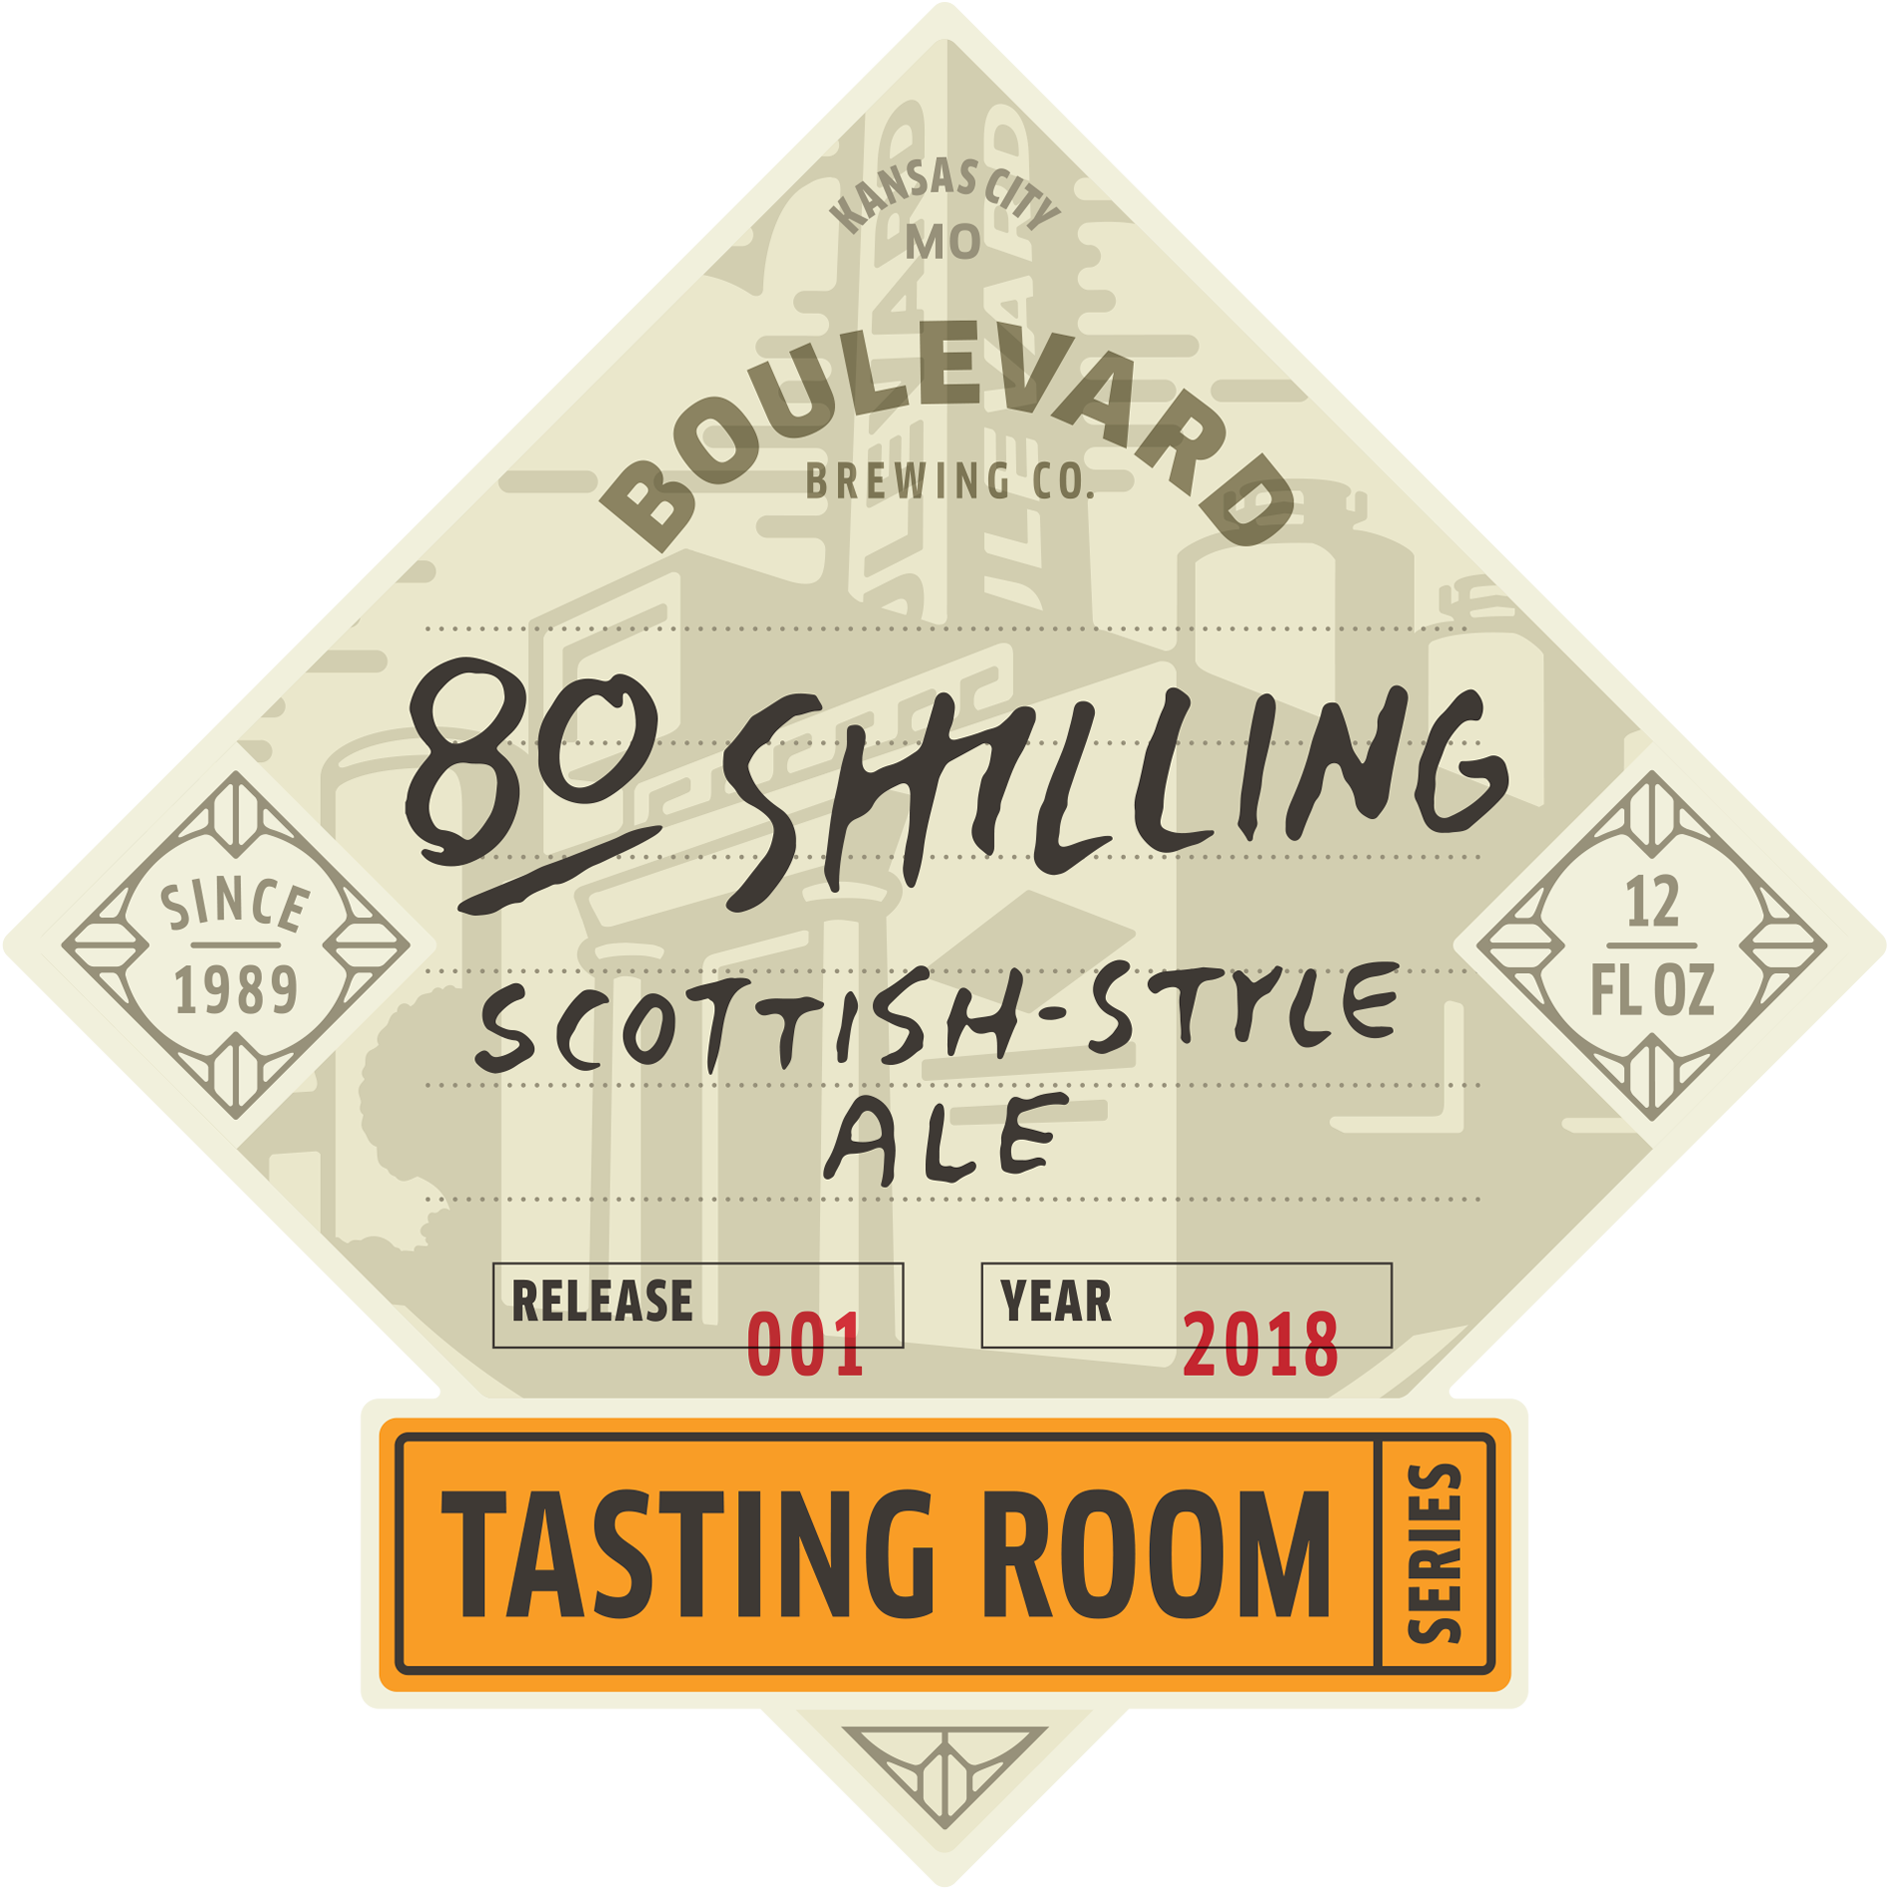 Tasting Room – 80 Shilling